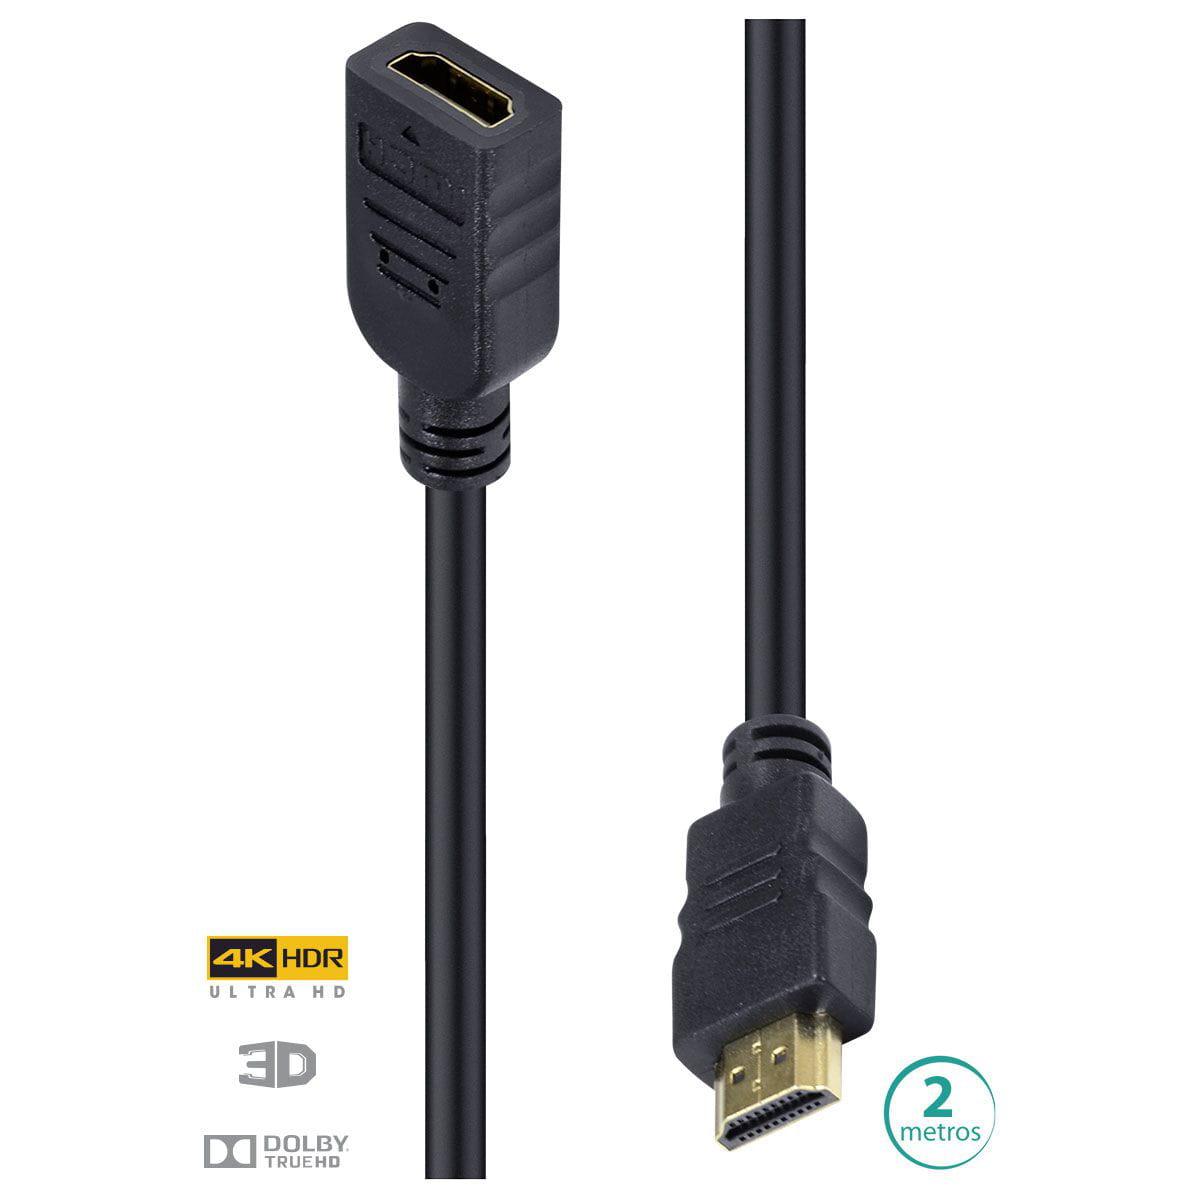 CABO EXTENSOR HDMI 2.0 4K HD 2 M H20EX-2